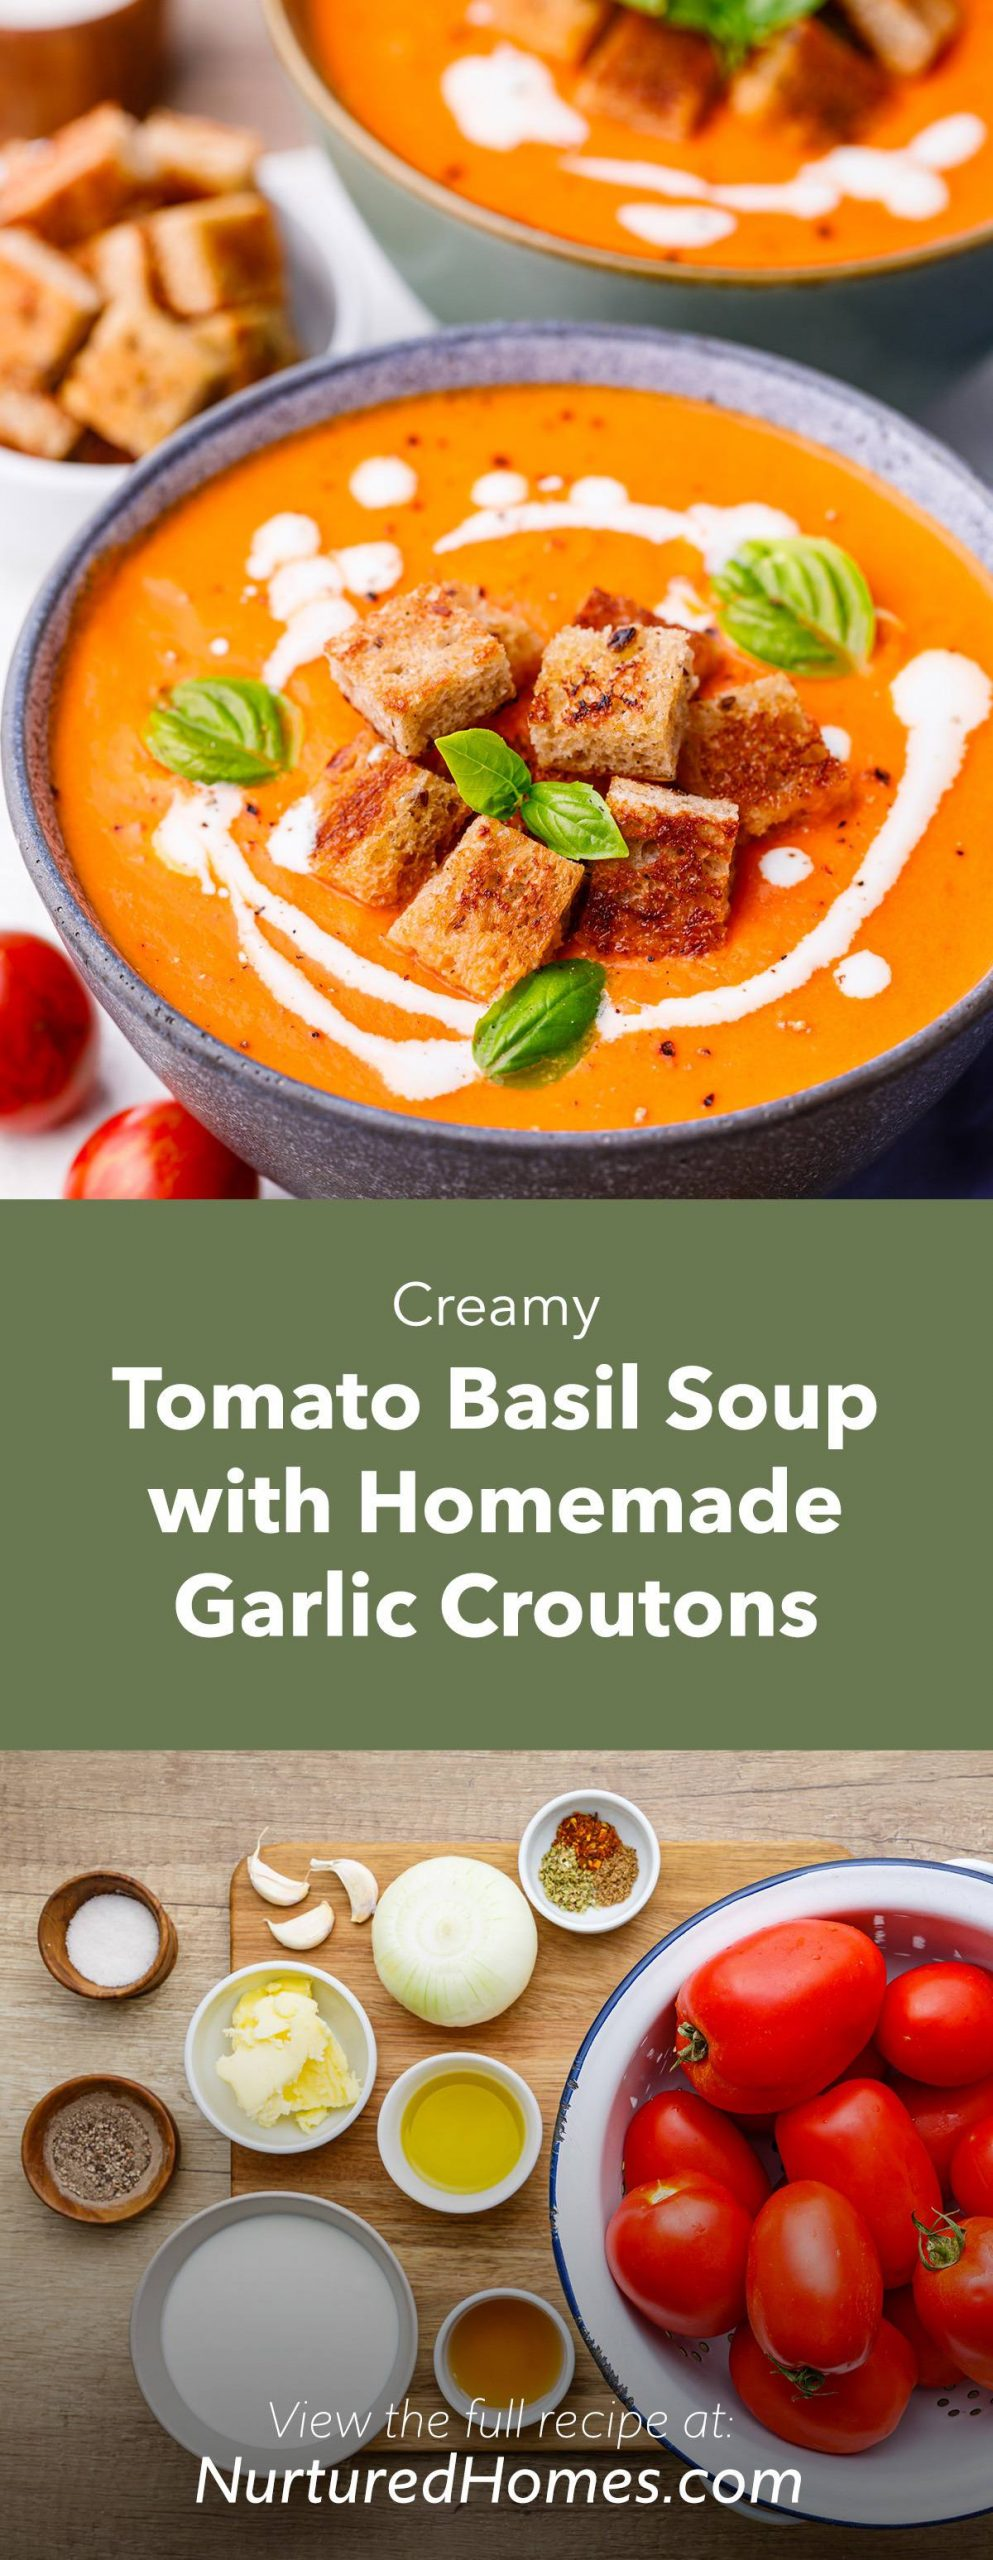 Creamy Tomato Basil Soup with Homemade Garlic Croutons